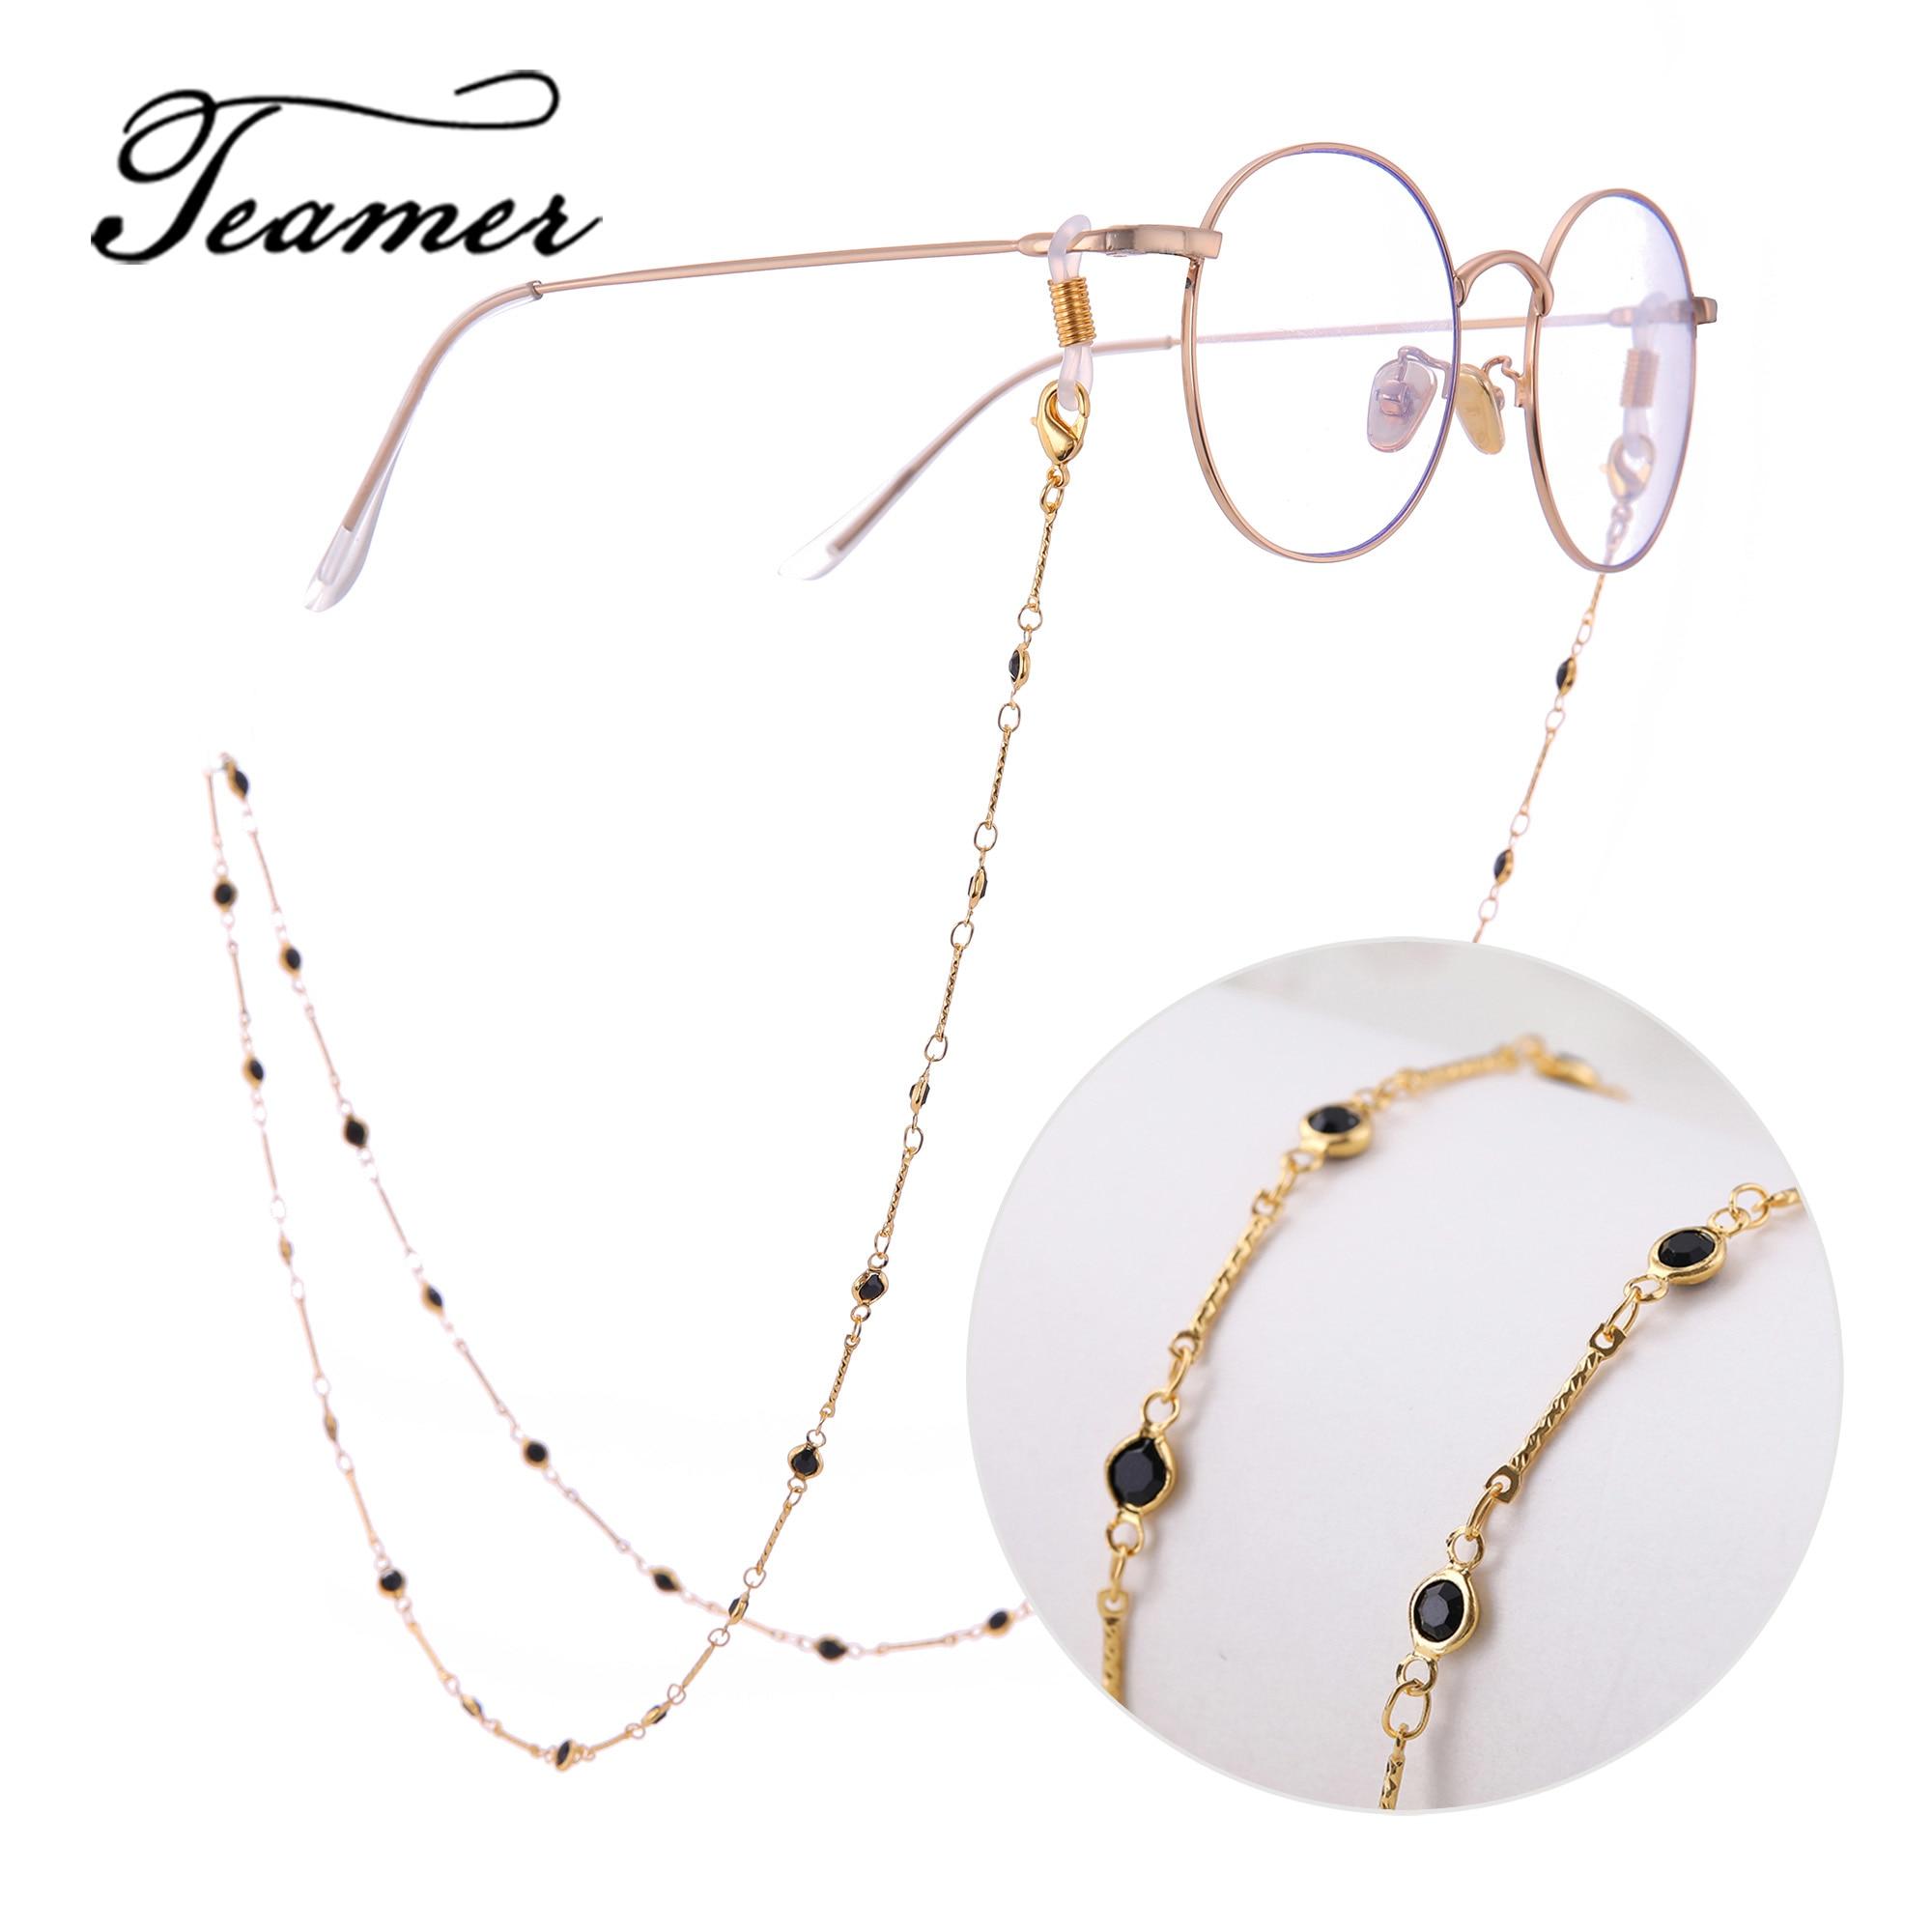 Teamer 78cm Fashion Sunglasses Lanyard Strap Necklace  Metal Eyeglass Black Crystal Glasses Chain Cord For Women Men